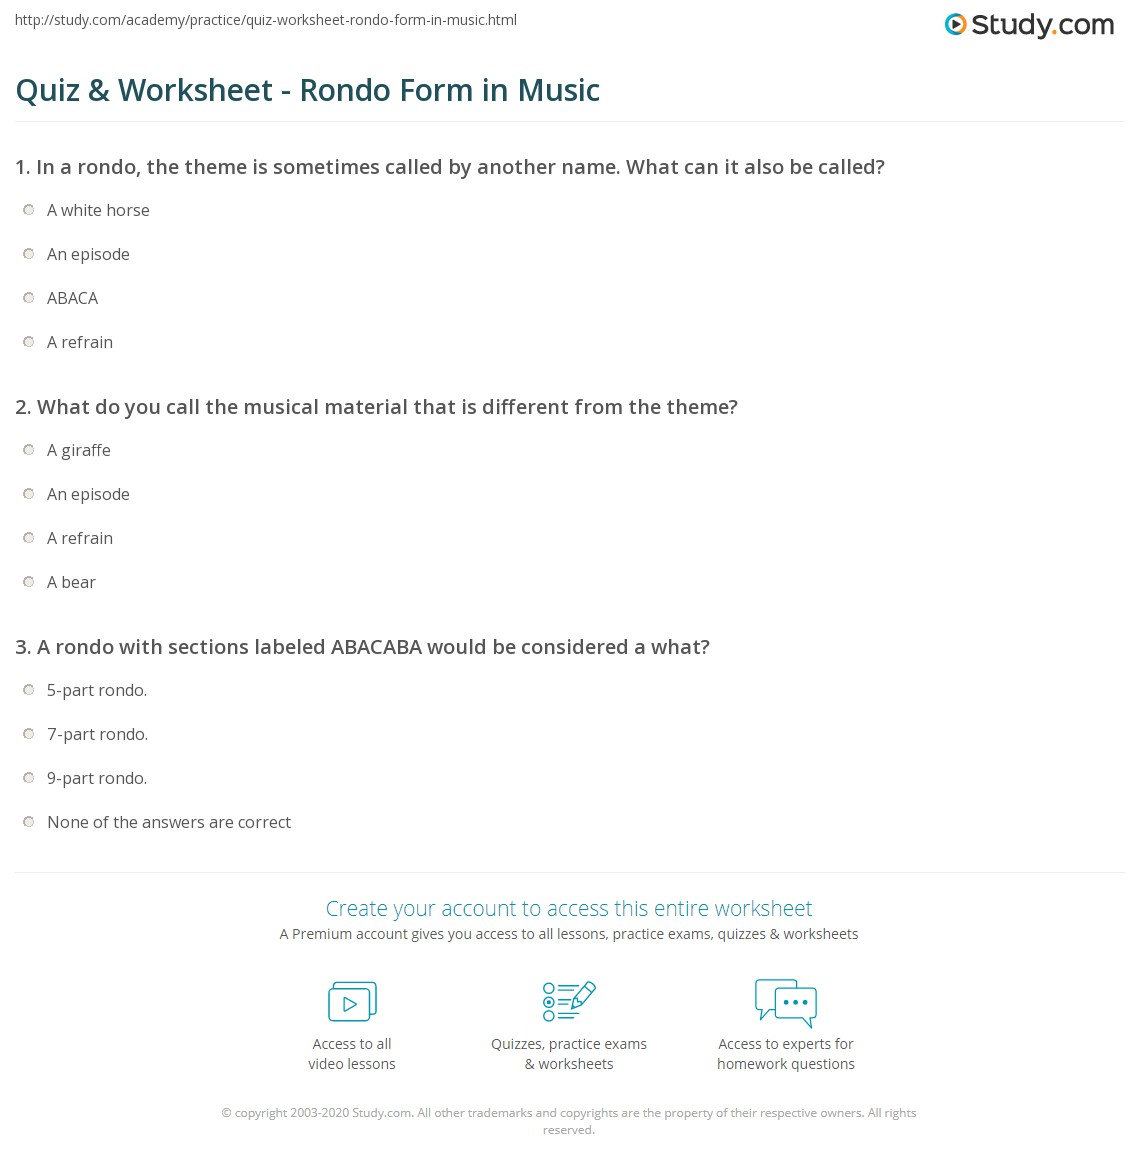 Quiz & Worksheet - Rondo Form in Music | Study.com